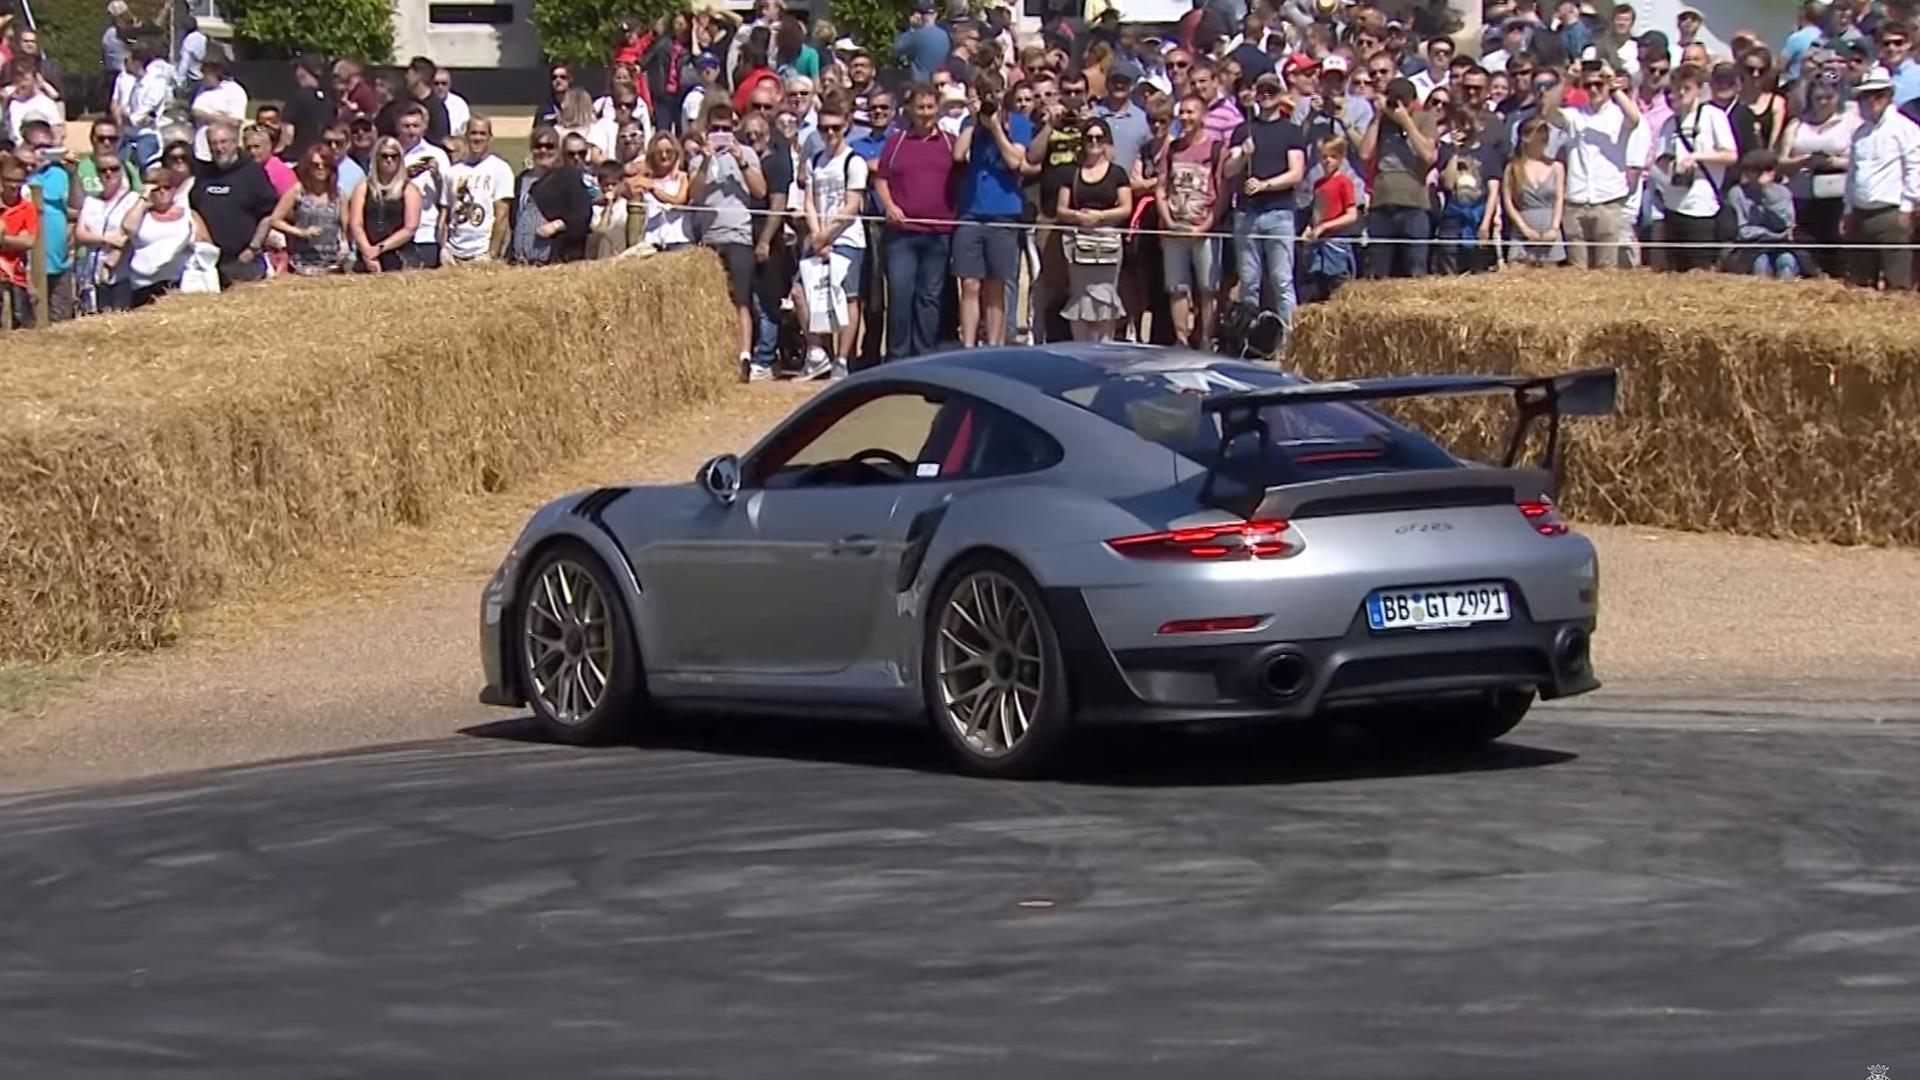 Porsche 911 GT2 RS Donut Attempt Fails At Goodwood on 2017 porsche cayman s, 2017 porsche carrera gt, 2017 porsche carrera s, 2017 porsche turbo s, 2017 porsche gt3, 2017 porsche 911 turbo, 2017 porsche turbo cabriolet,